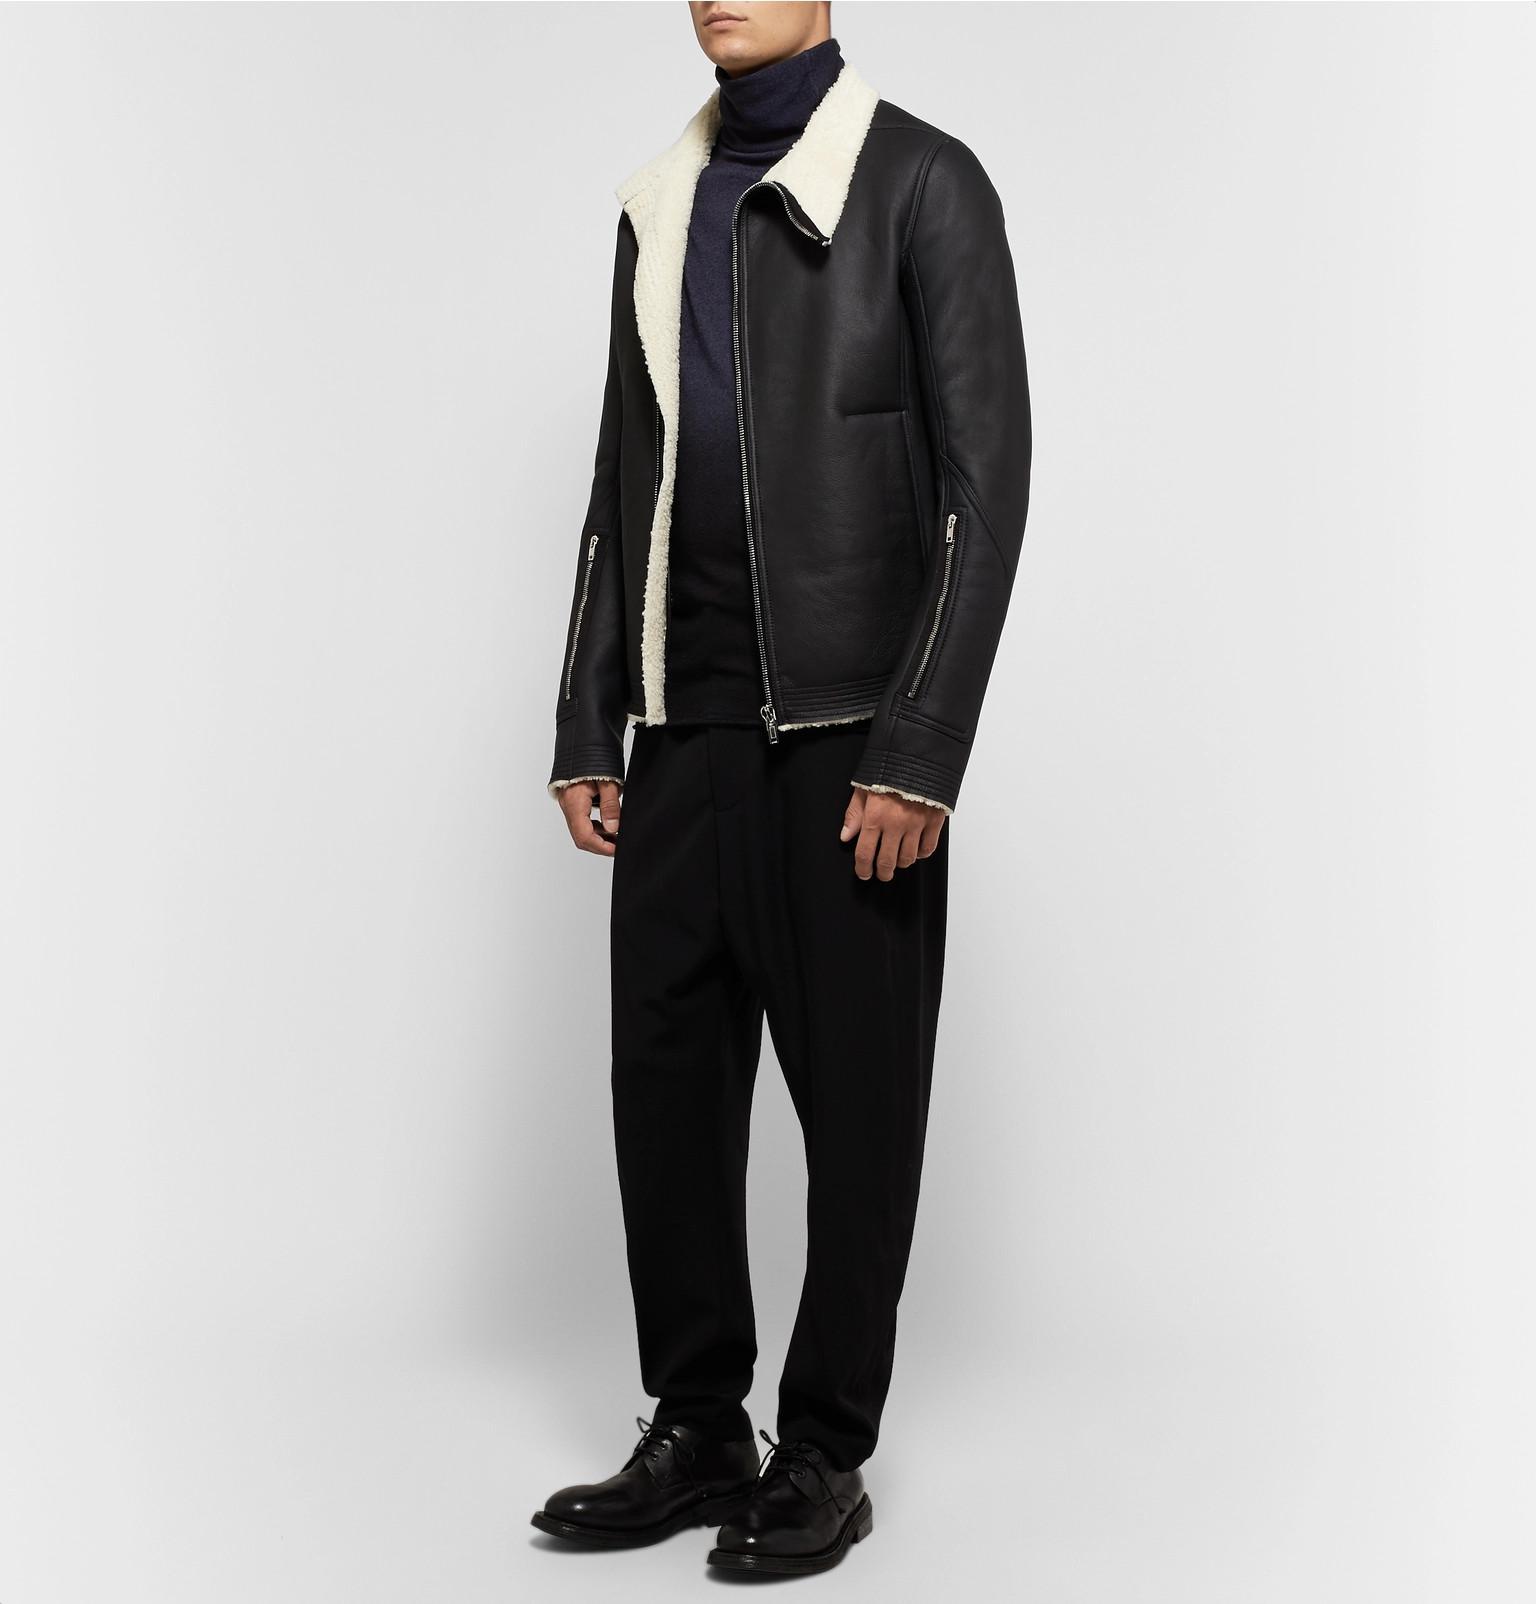 View For Dégradé Benenato Rollneck Virgin Fullscreen Wool Men Lyst Black Isabel Sweater 16nvZ0qq